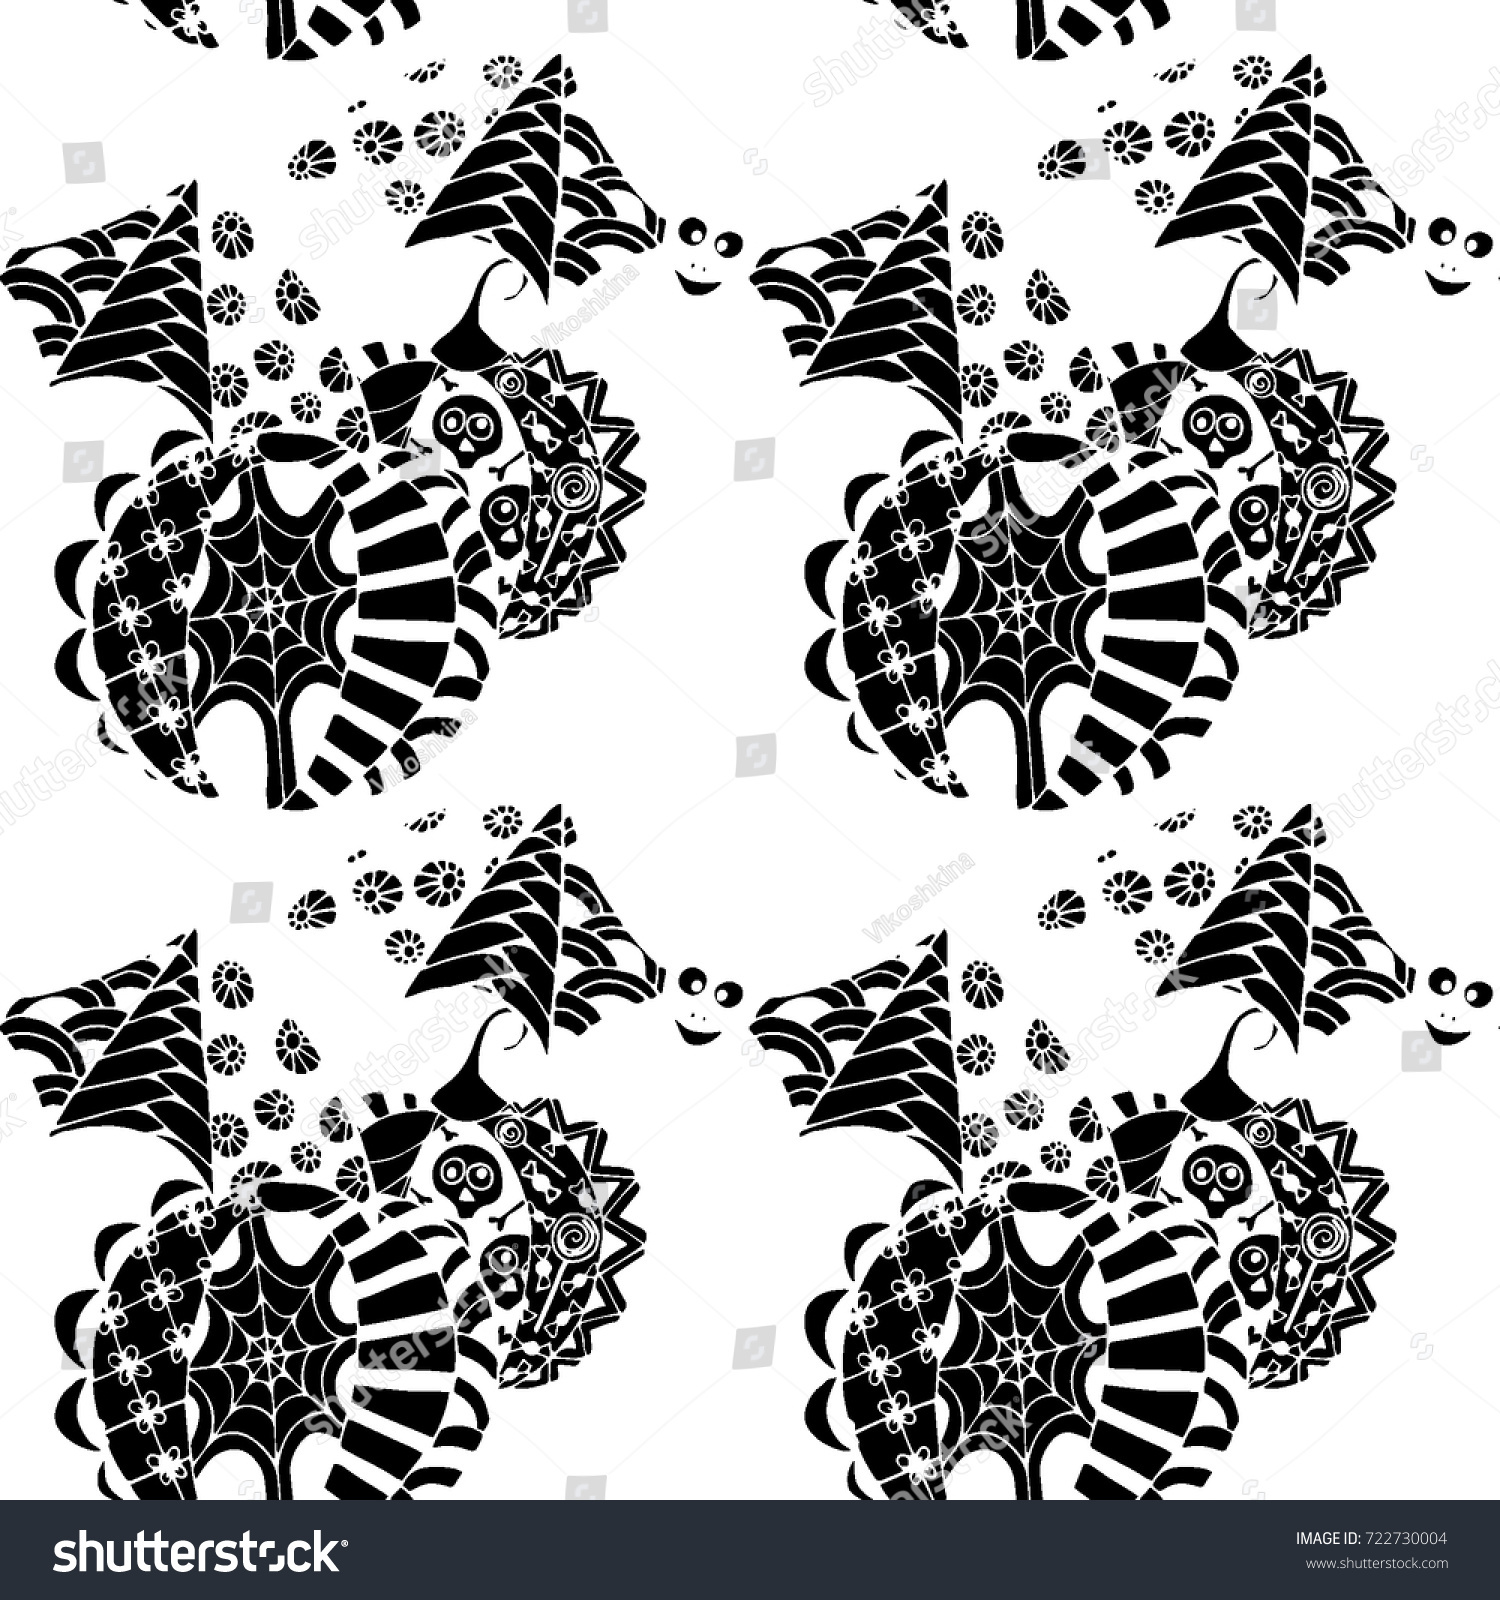 Black White Halloween Pattern Zentangle Bats Stock Vector Royalty Free 722730004